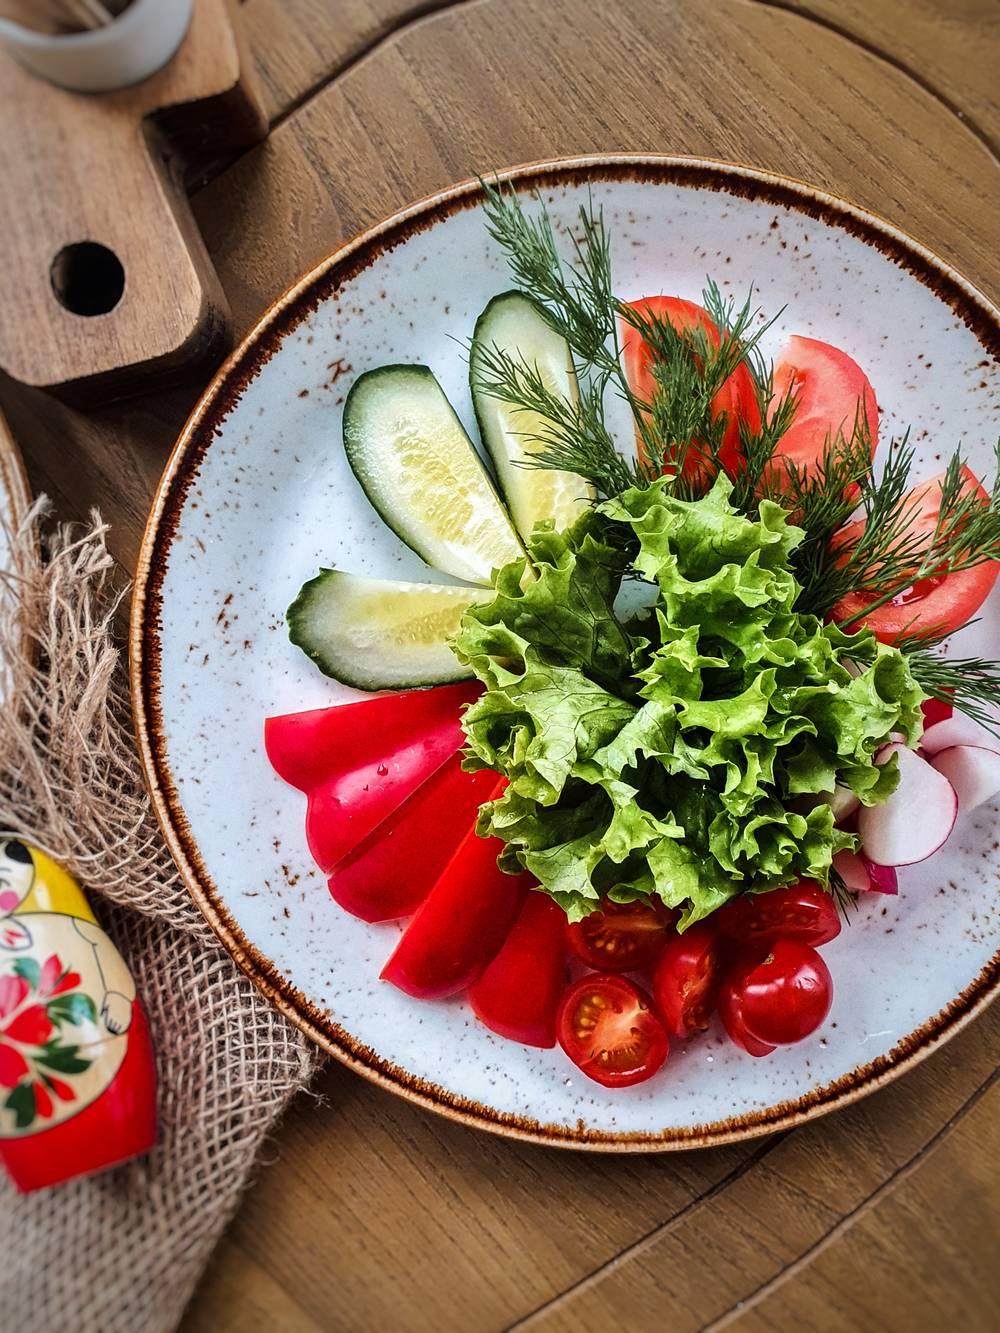 Бабушкин огород детское меню доставка еды Волгоград кафе Marusya Маруся Дома